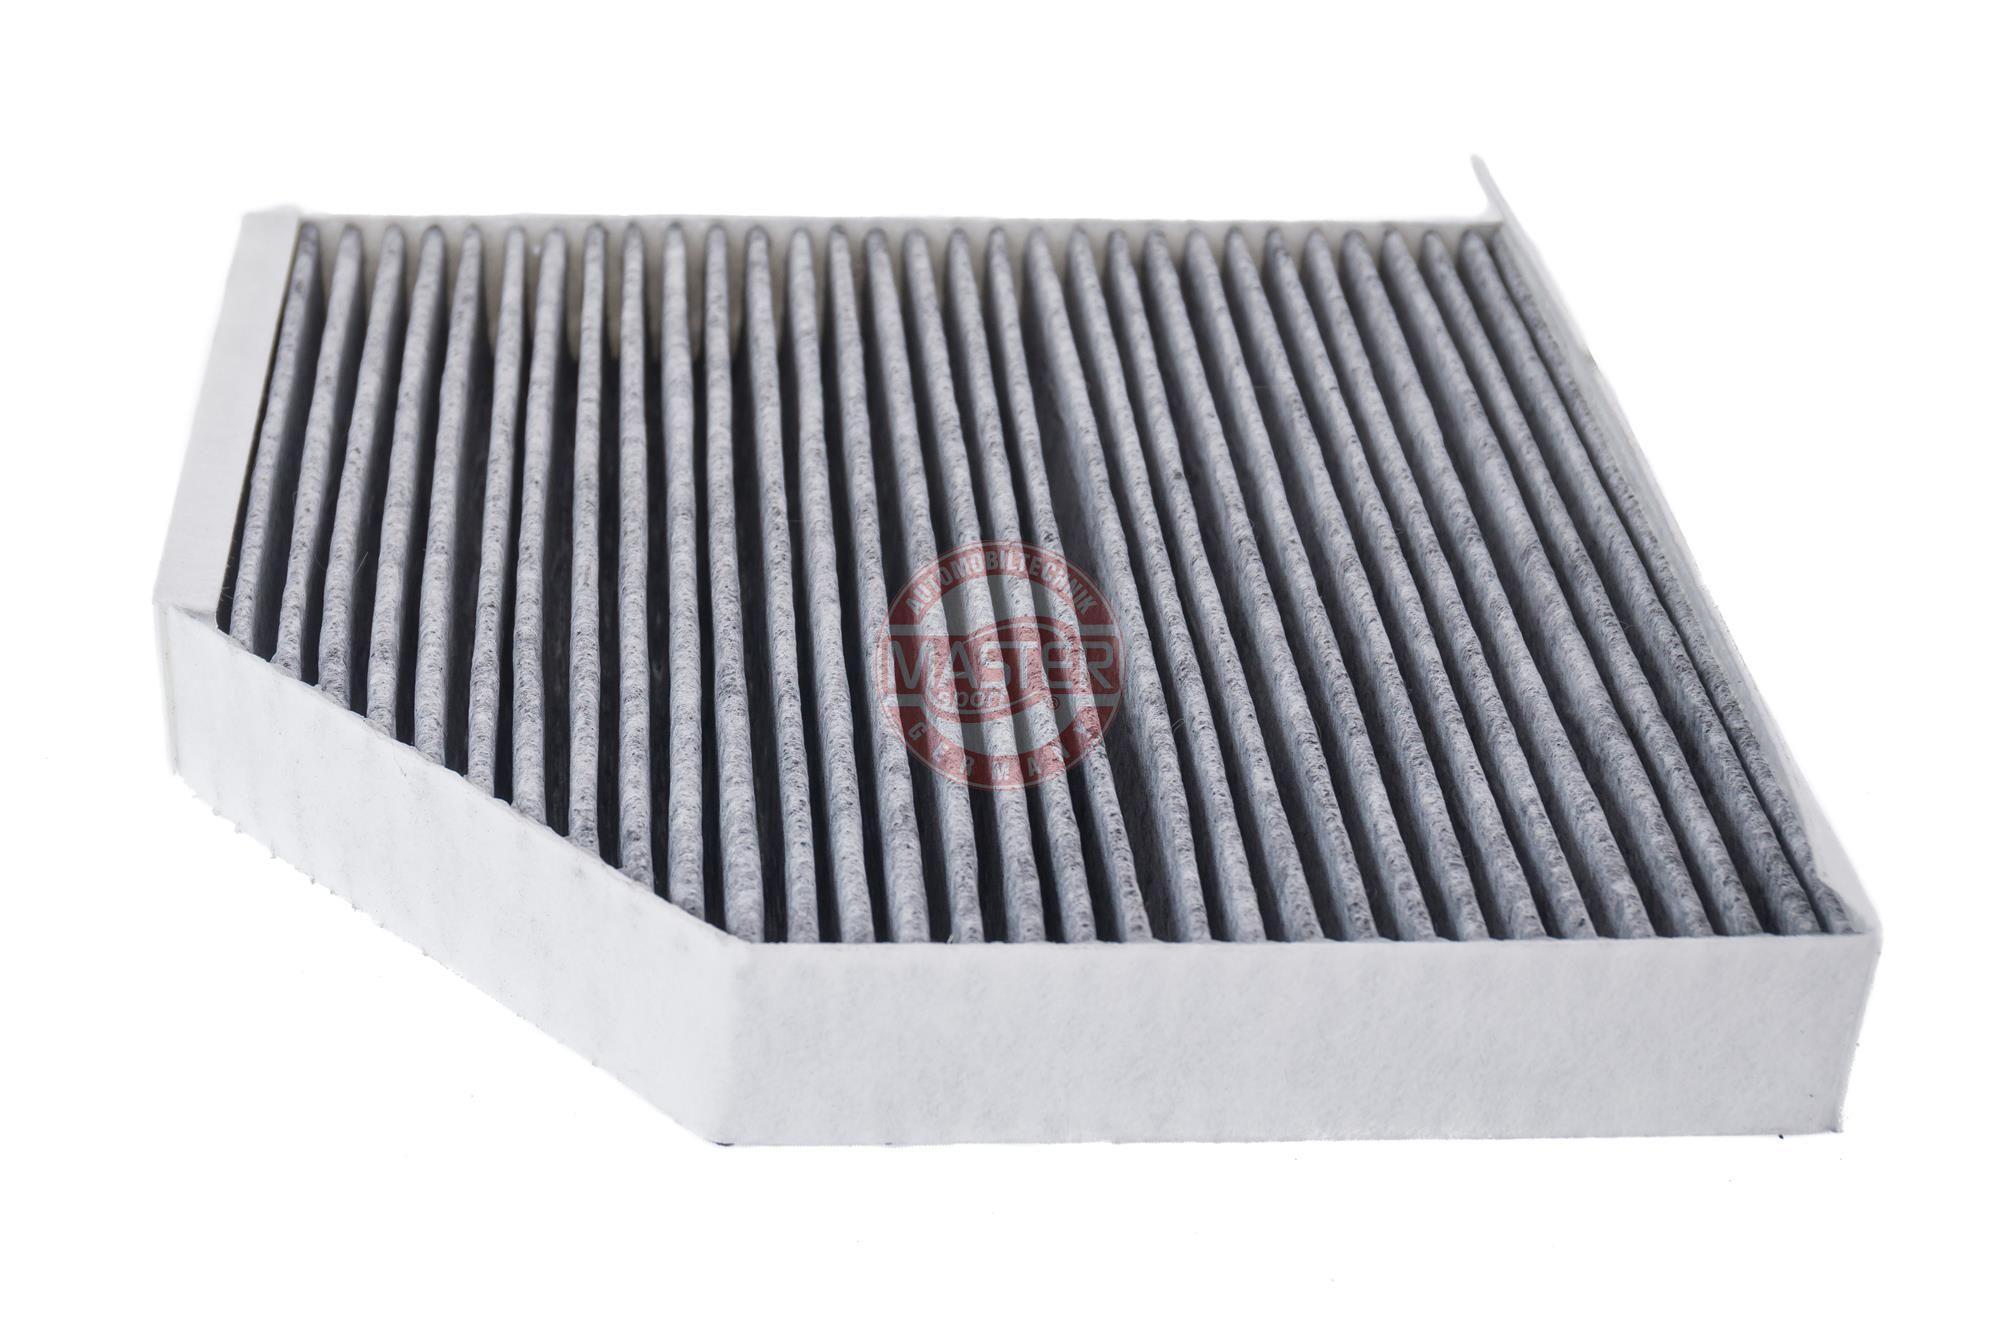 AUDI A8 2018 Klimafilter - Original MASTER-SPORT 2641-IF-PCS-MS Breite: 253mm, Höhe: 35mm, Länge: 256mm